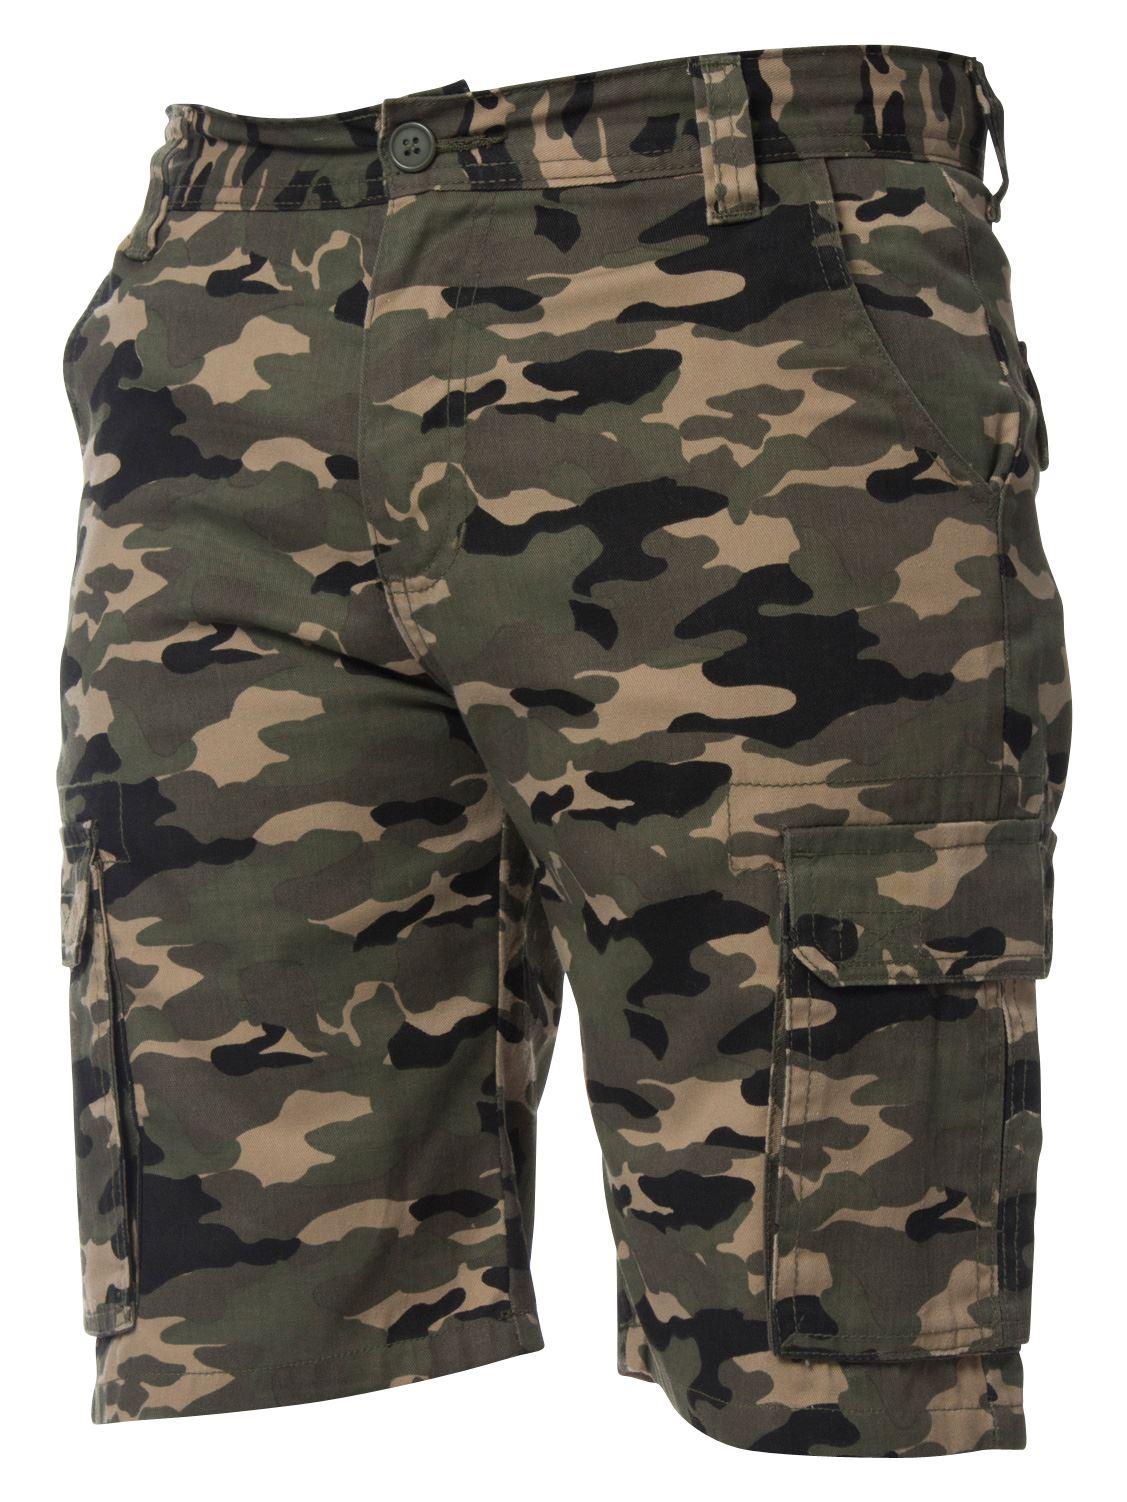 Kruze-Jeans-para-Hombre-Pantalones-Cortos-Combate-del-ejercito-camuflaje-Camo-Trabajo-Shorts miniatura 14